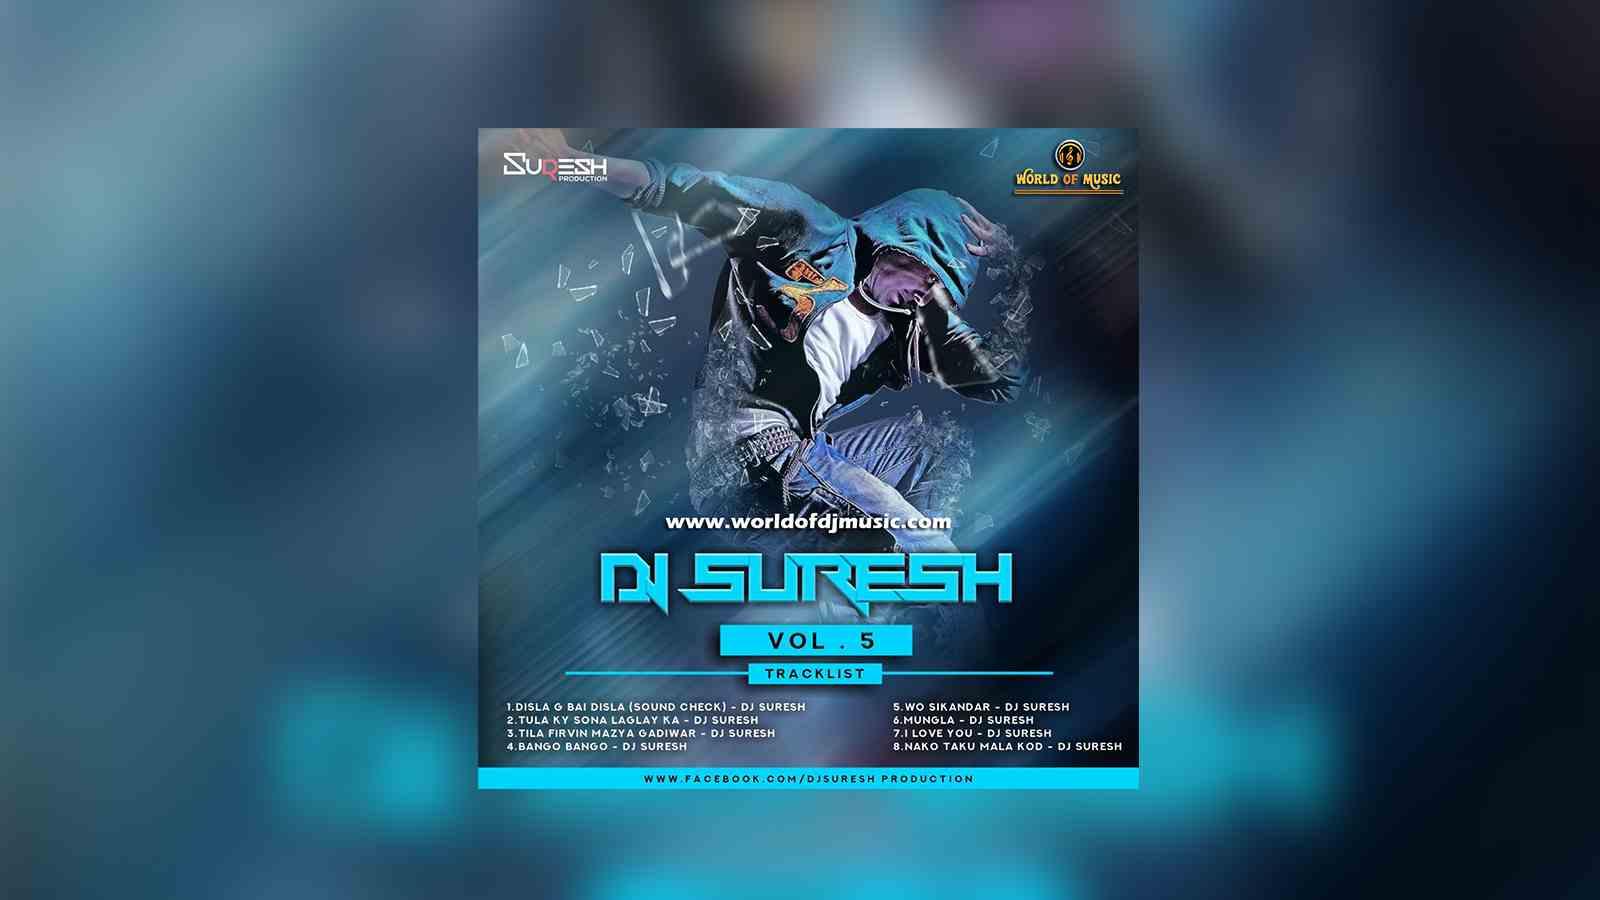 Mungla Mungla (Remix) - Dj Suresh